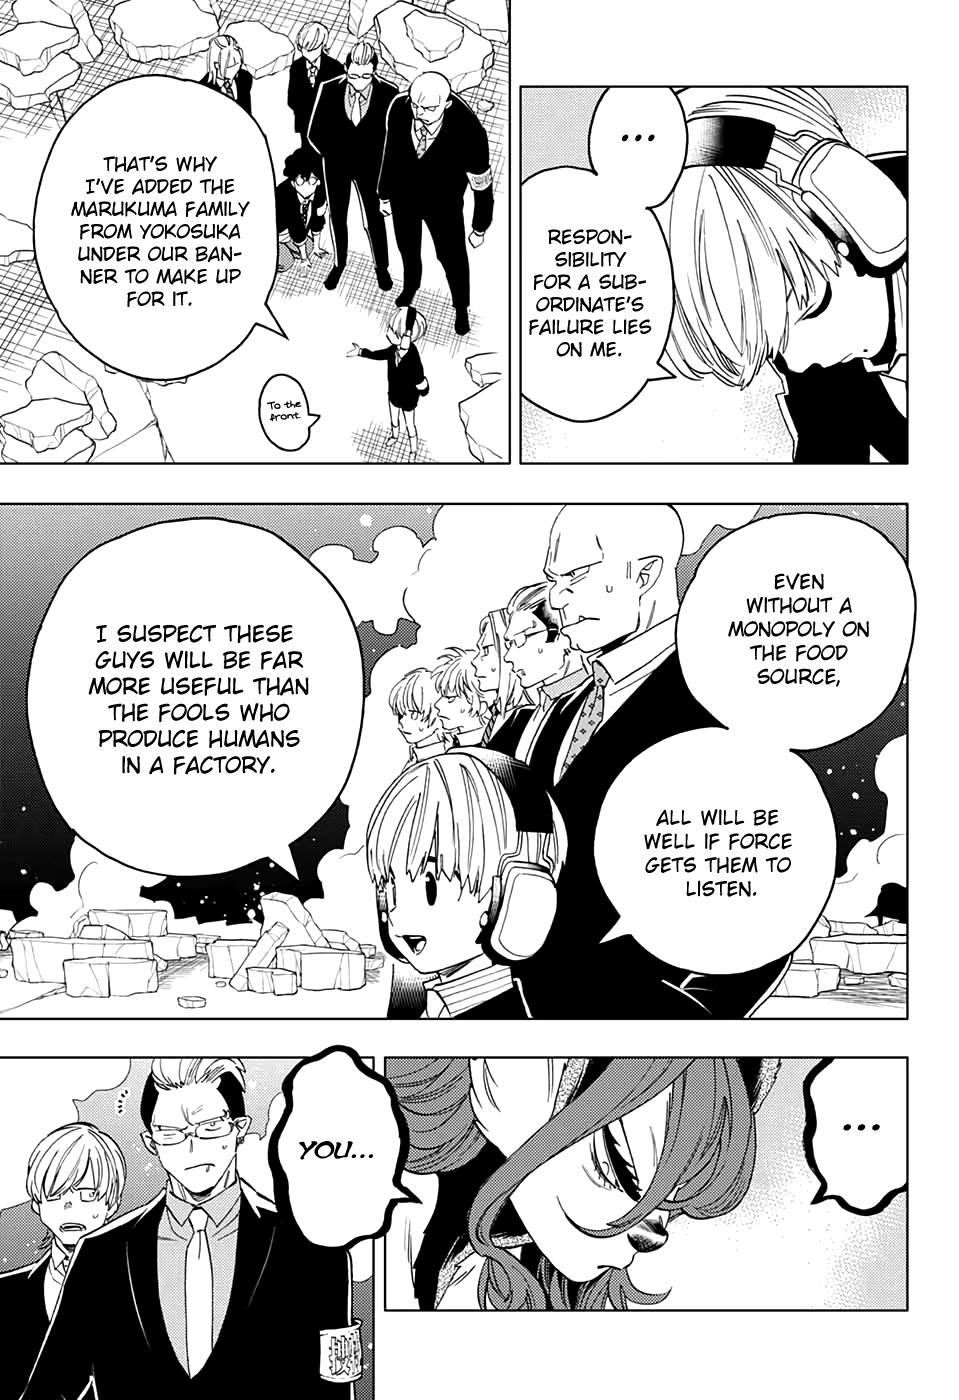 kemono jihen manga, read kemono jihen , kemono jihen , anime kemono jihen , kemono jihen anime, kemono jihen characters, kemono jihen wiki, kemono jihen episode 1, kemono jihen episode 2, kemono jihen kon, kemono jihen season 2, kemono jihen chapter 1, kemono jihen kabane, kemono jihen where to watch, kabane kemono jihen, shiki kemono jihen, akira kemono jihen gender, kemono jihen characters, kemono jihen wiki, kemono jihen kon, kemono jihen season 2, kemono jihen voice actors, kemono jihen mal, kemono jihen characters, kemono jihen wiki, kemono jihen kon, kemono jihen season 2, kemono jihen voice actors, kemono jihen mal, kemono jihen episodes, kemono jihen kabane, google-keywords-kemono-jihen--2021-04-17, , KeywordSearch Volume (Global)CPC (Global)Competition (Global)Trending %Apr 2020May 2020Jun 2020Jul 2020Aug 2020Sep 2020Oct 2020Nov 2020Dec 2020Jan 2021Feb 2021Mar 2021, kemono jihen anime, kemono jihen akira, kemono jihen aya, kemono jihen anime studio, kemono jihen ao3, kemono jihen akira twin, kemono jihen anime where to watch, kemono jihen anime kage, kemono jihen akira voice actor, kemono jihen anime planet, kemono jihen batch, kemono jihen baka, kemono jihen bahasa indonesia, kemono jihen behind the voice actors, kemono jihen berapa episode, kemono jihen background, kemono jihen baka kitsune, kemono jihen birthday, kemono jihen blonde hair, kemono jihen baca, kemono jihen characters, kemono jihen chapter 50, kemono jihen chapter 51, kemono jihen chapter 1, kemono jihen crunchyroll, kemono jihen cast, kemono jihen chapter 52, kemono jihen chapter 49, kemono jihen chapter 32, kemono jihen chapters, kemono jihen dorotabo, kemono jihen download, kemono jihen does kon like kabane, kemono jihen dub release date, kemono jihen description, kemono jihen detective, kemono jihen demon slayer, kemono jihen discord, kemono jihen deer, kemono jihen demon, kemono jihen e, kemono jihen episode 1, kemono jihen episode 2, kemono jihen ep 2, kemono jihen episodes, kemono jih